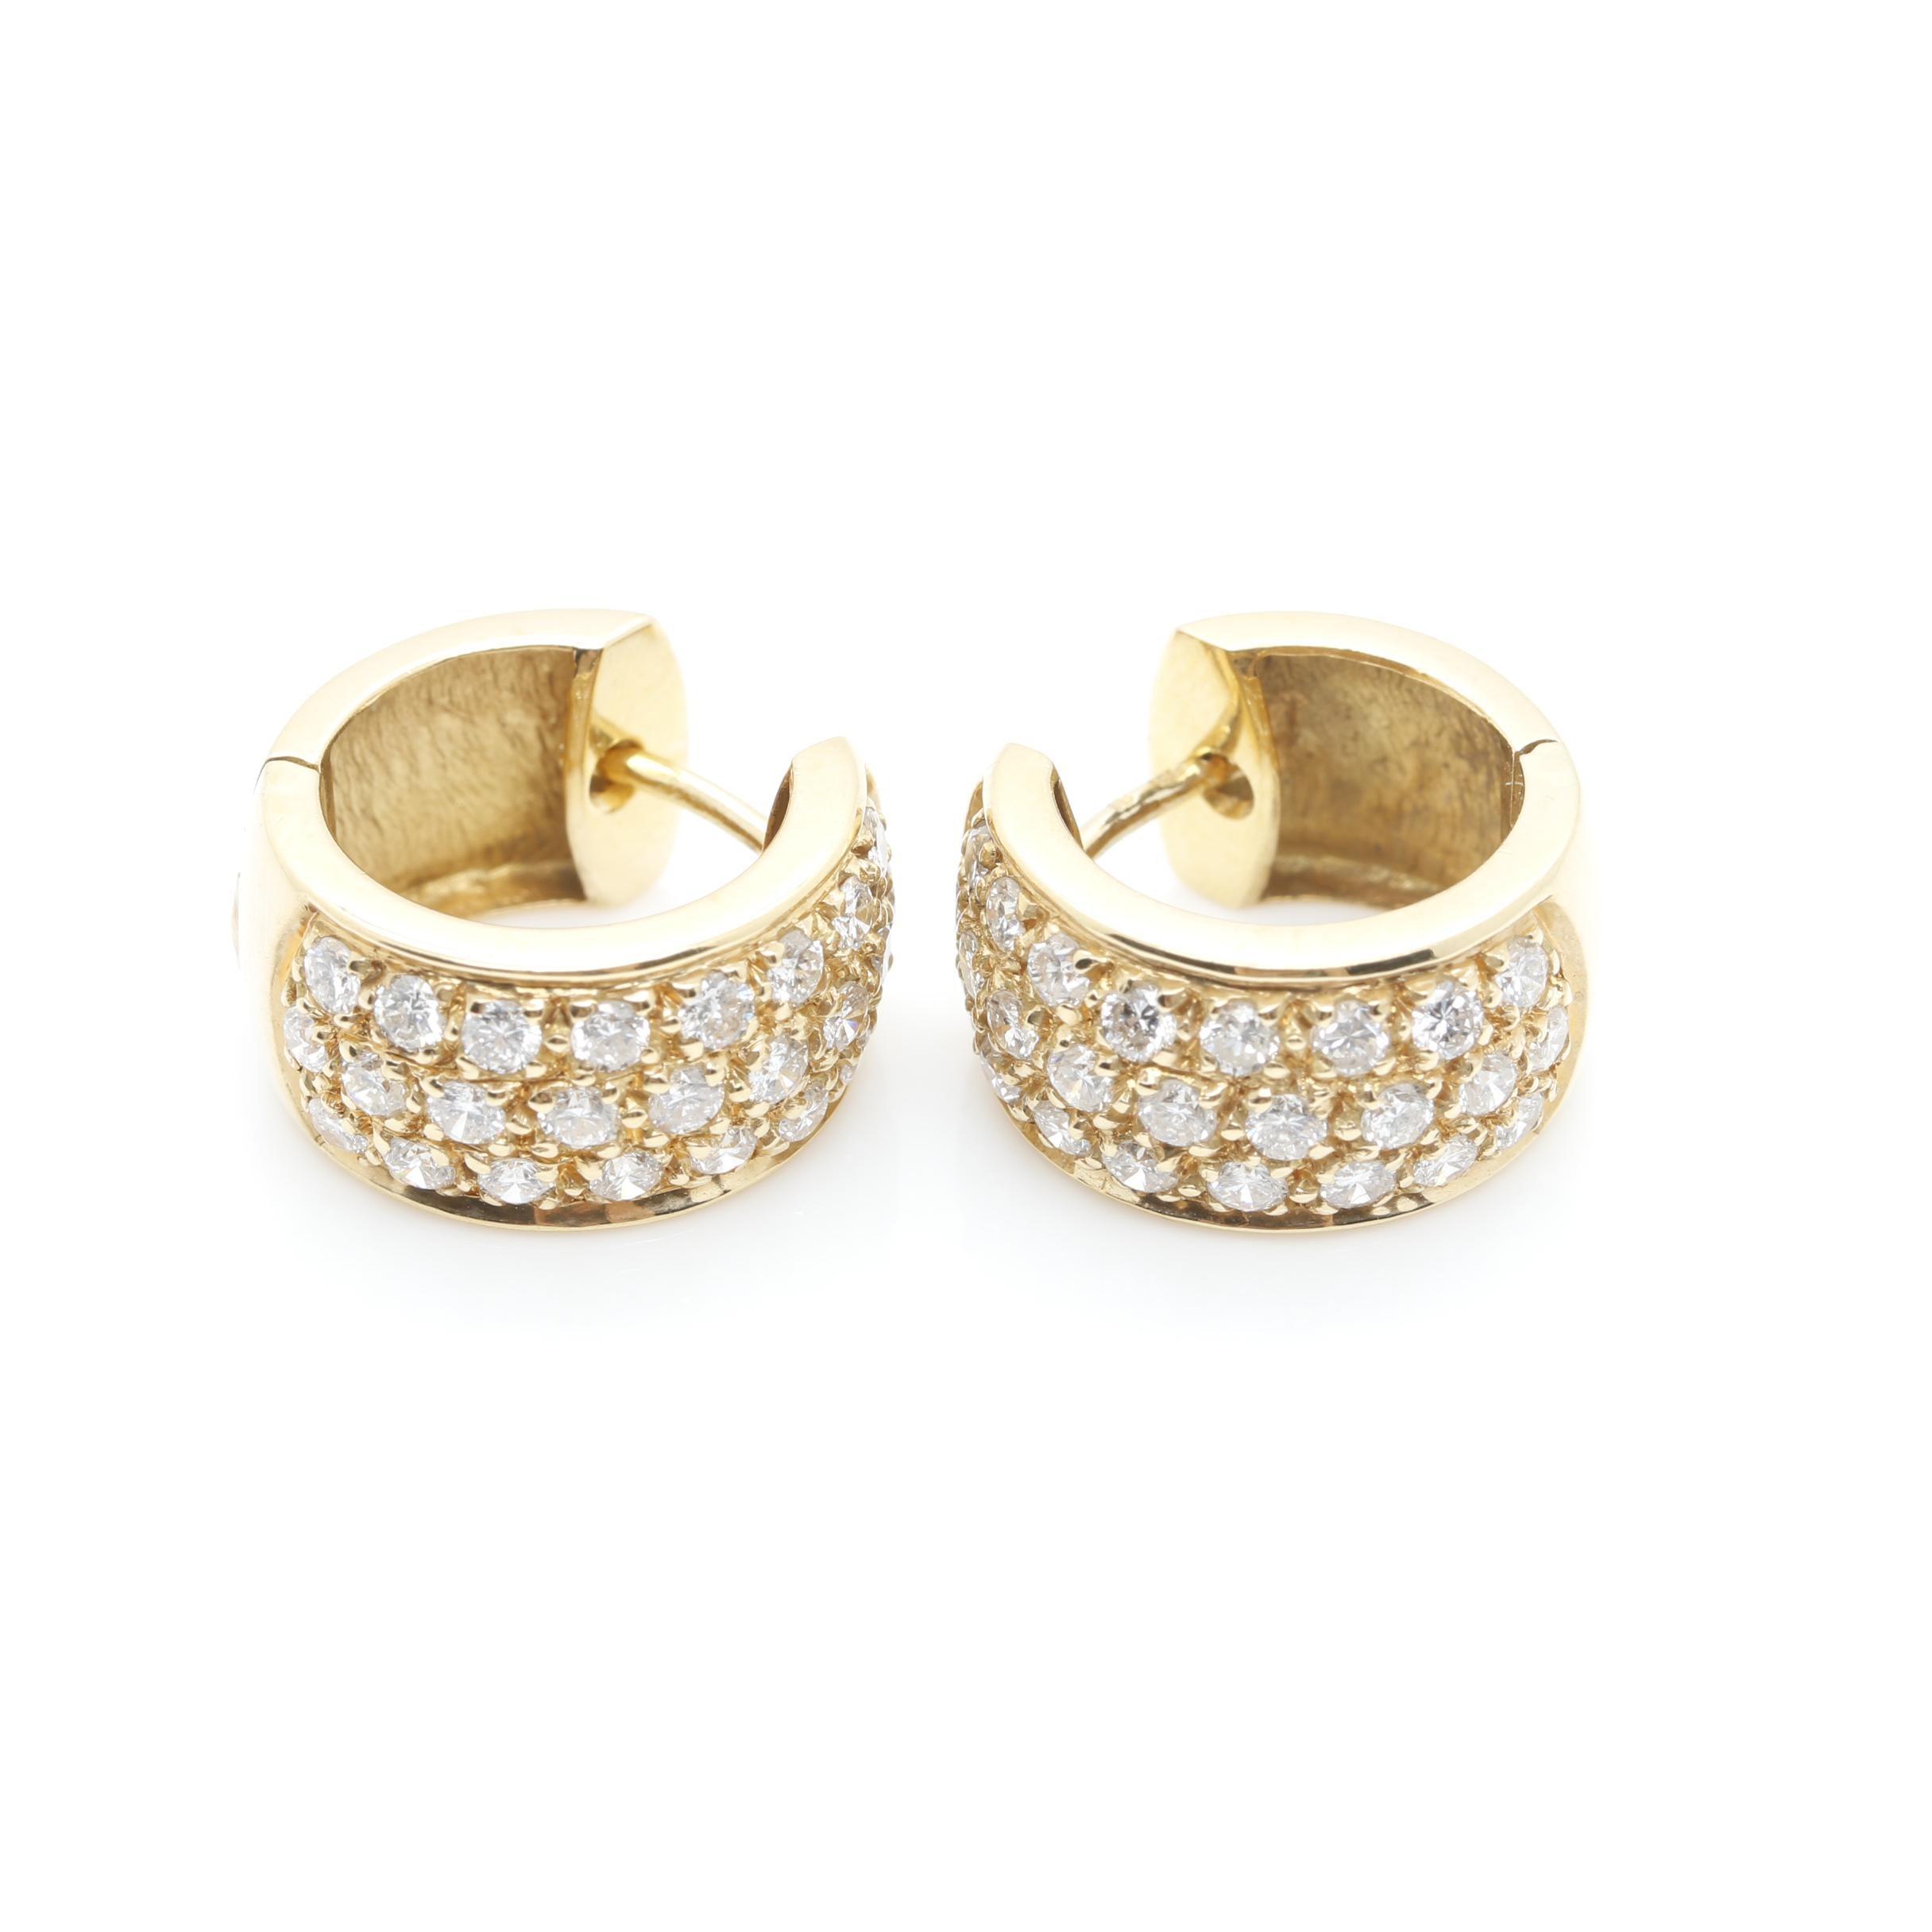 18K Yellow Gold 1.44 CTW Diamond Huggie Hoop Earrings